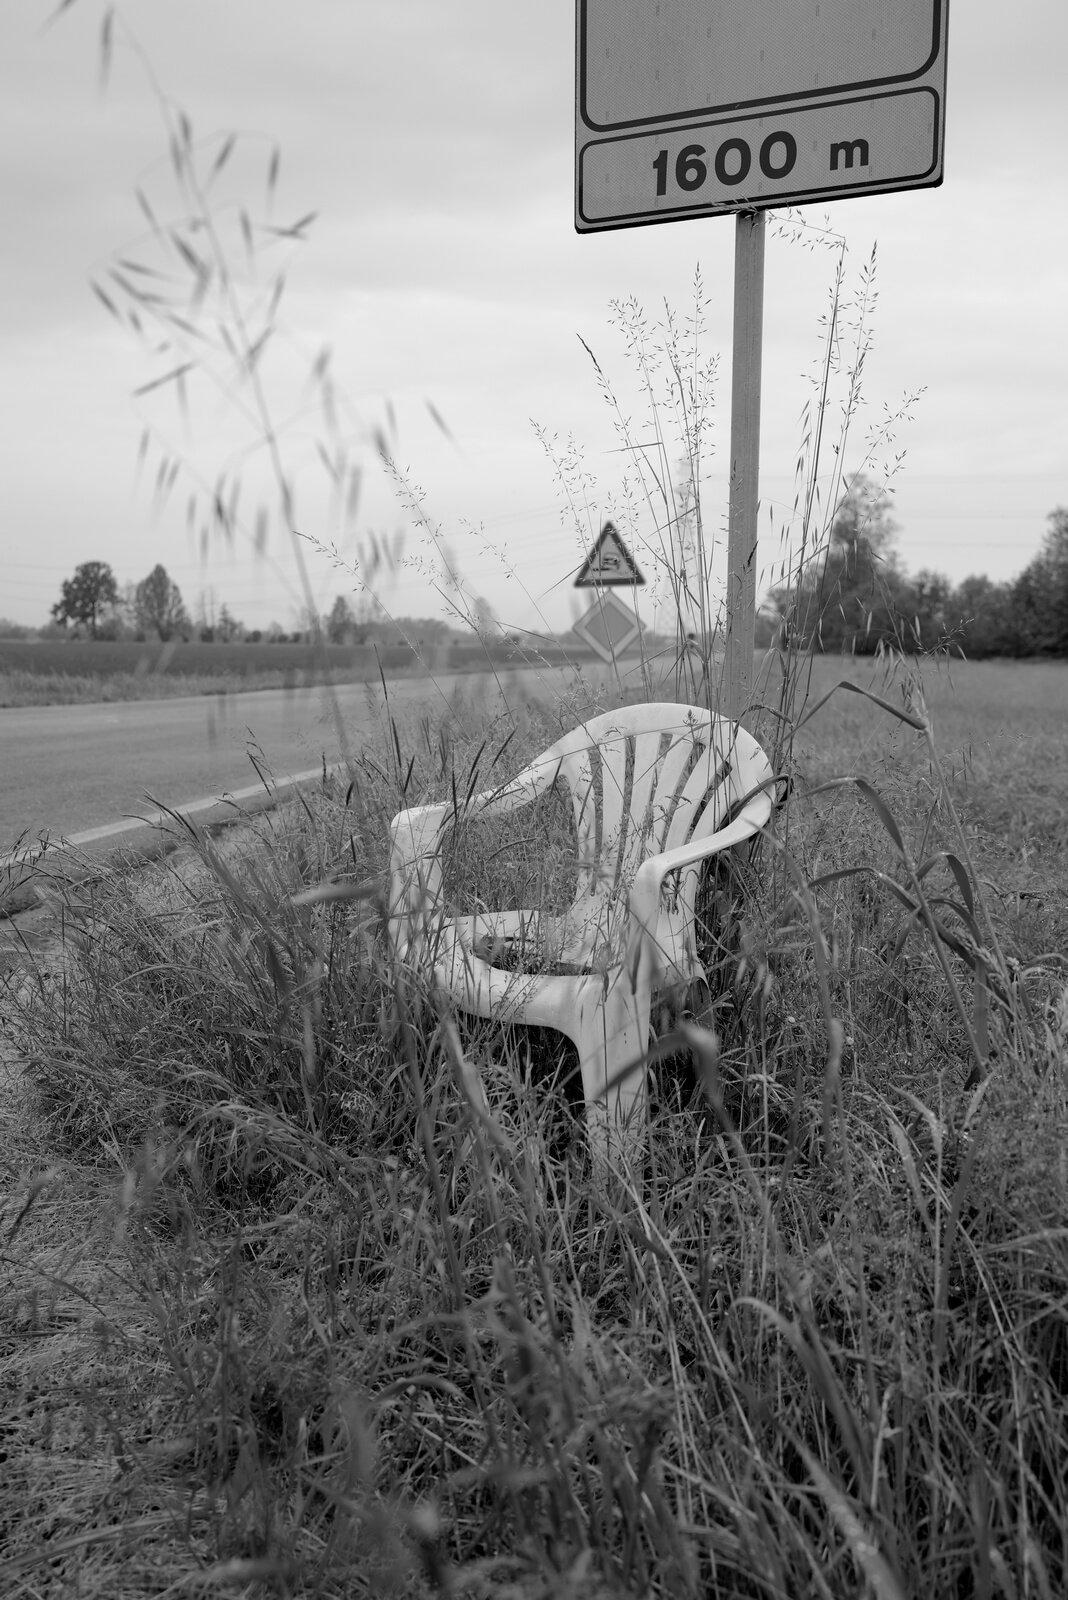 18_The-Absence_Attilio-Solzi